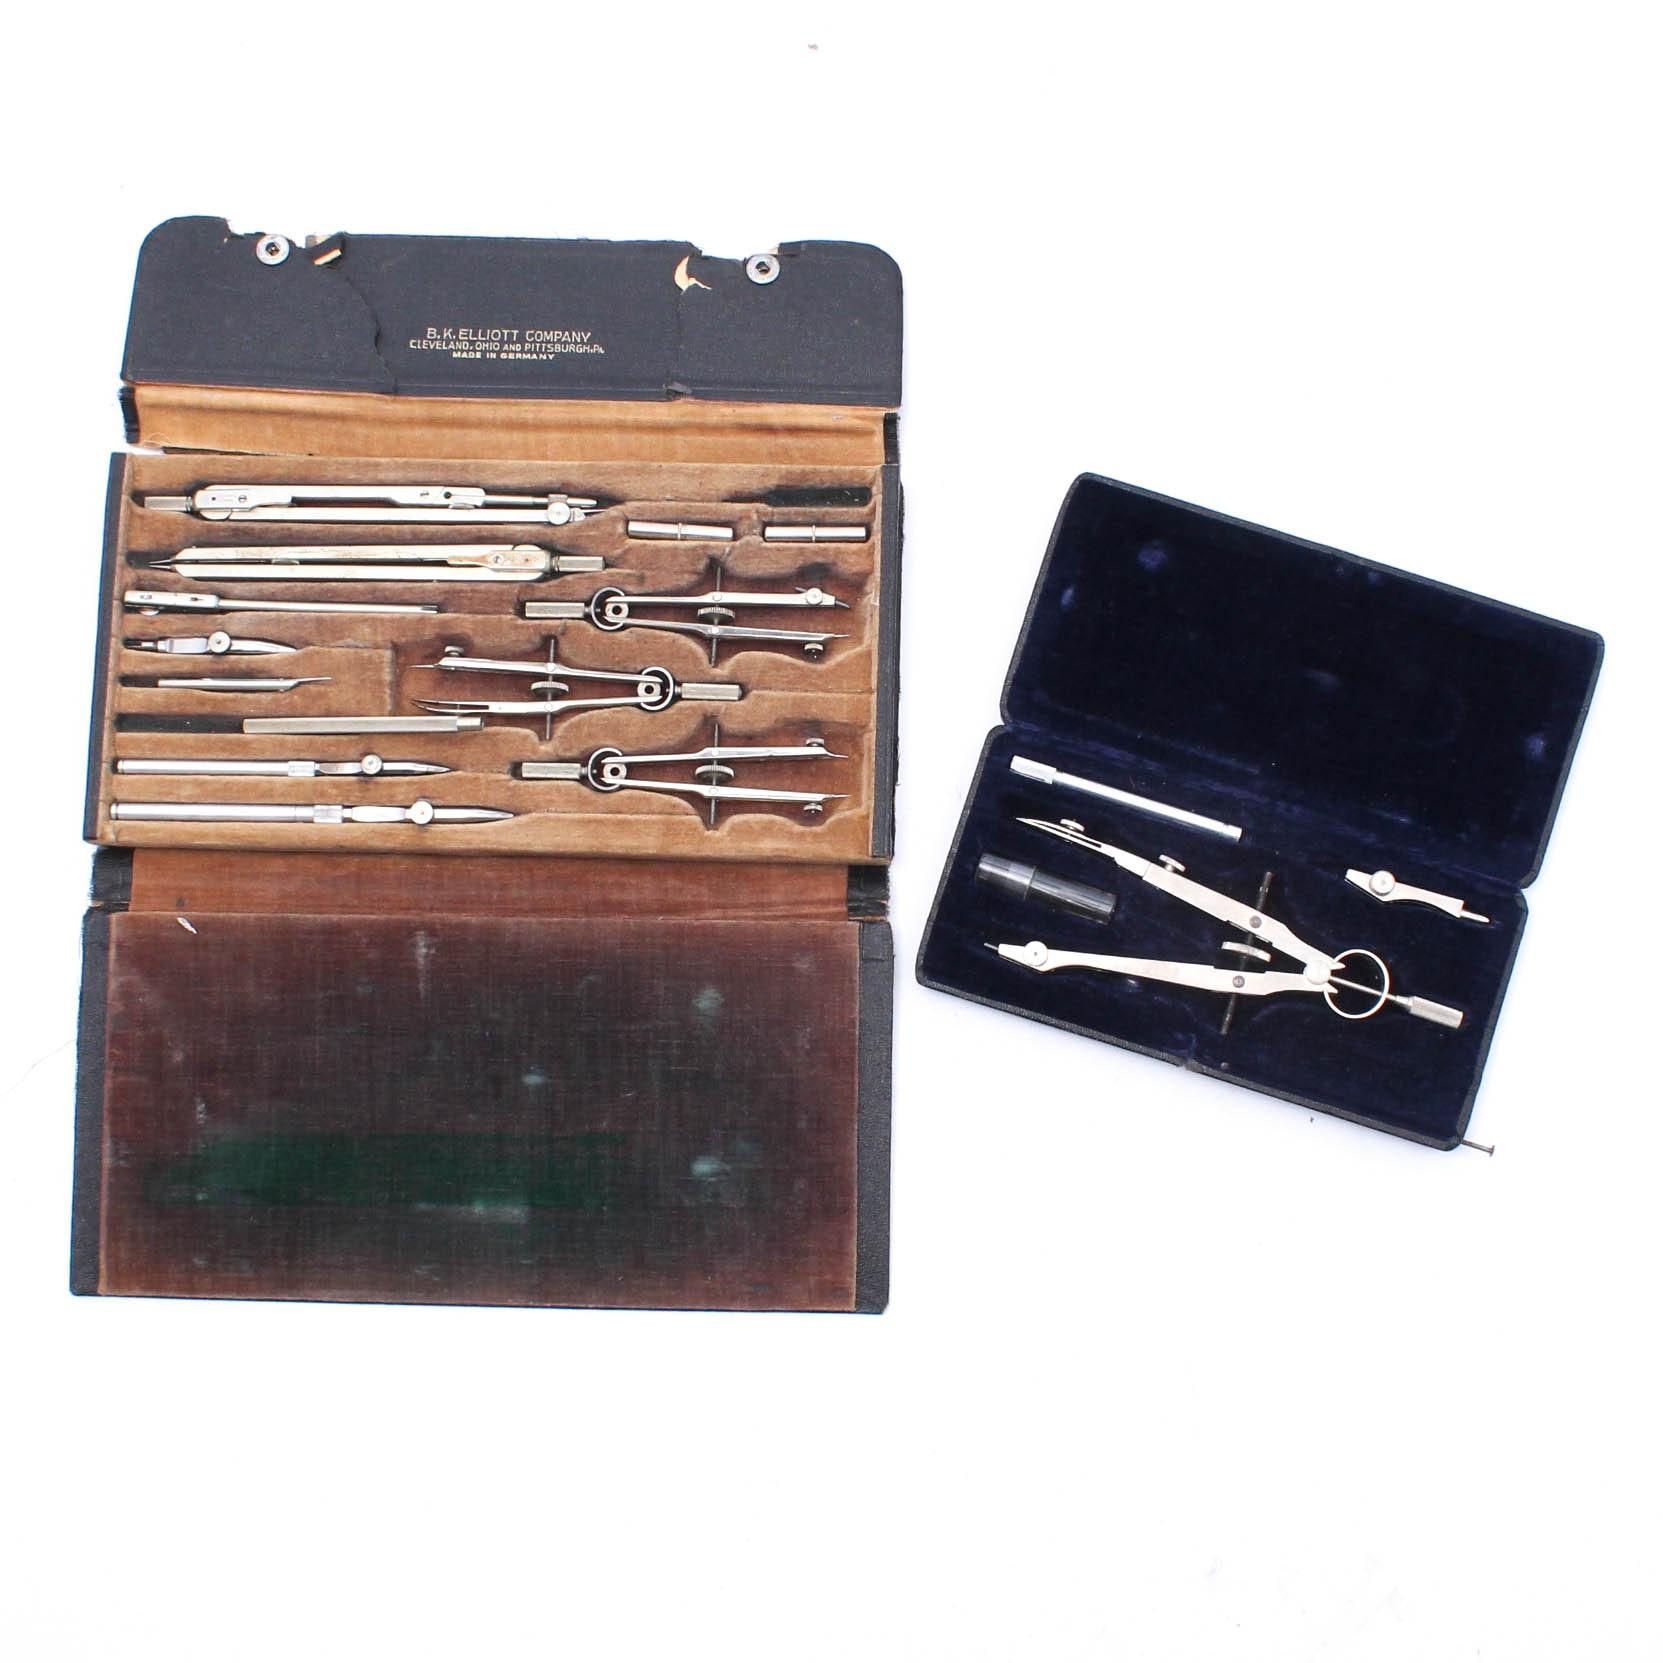 German B.K. Elliot Drafting Kit with Compass Set